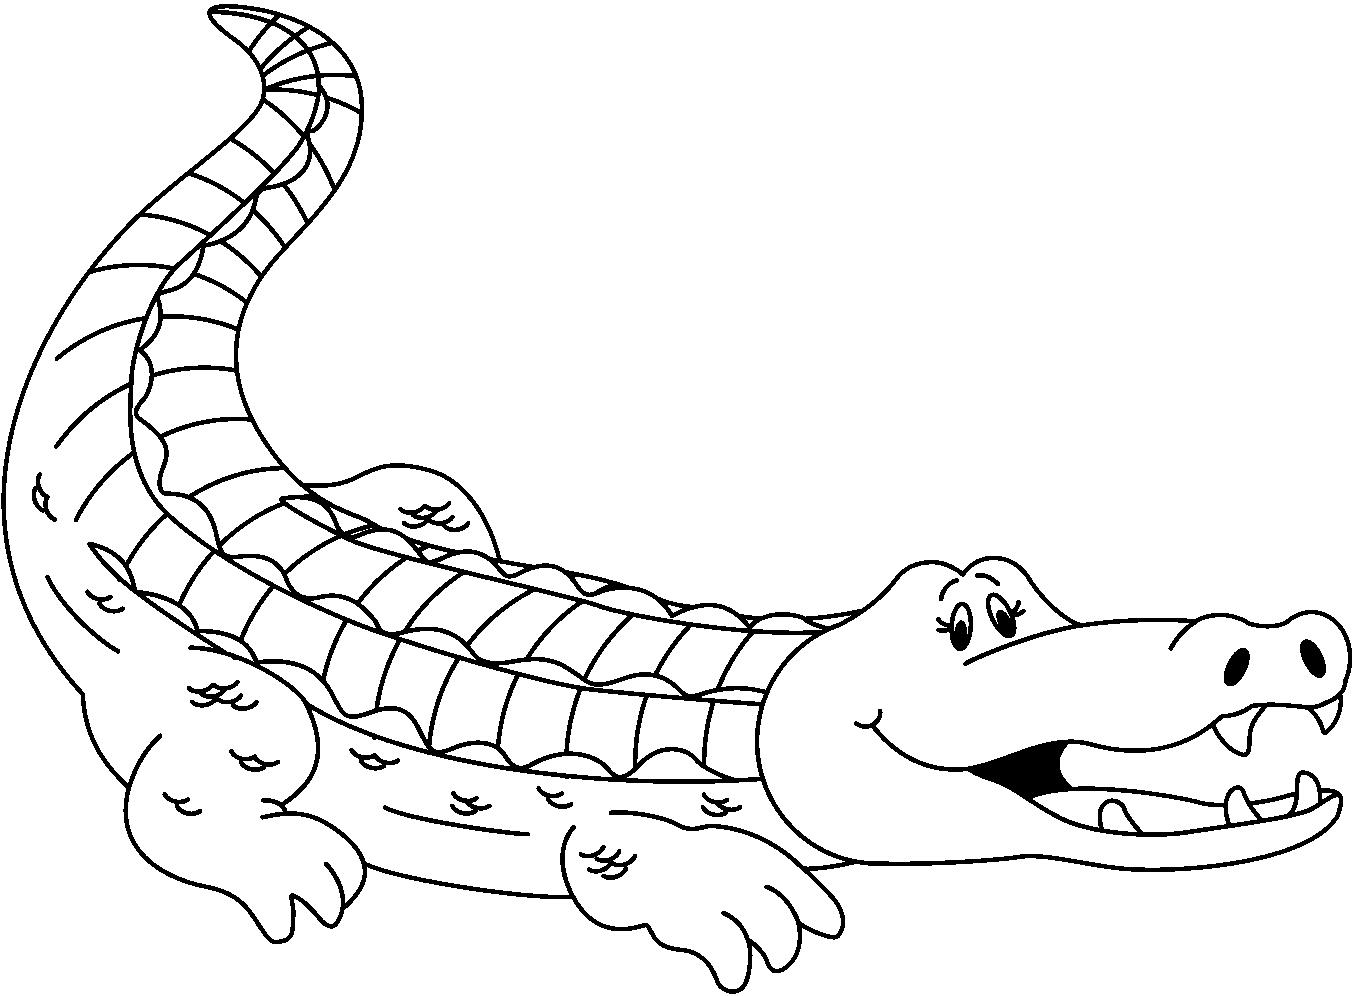 PNG Crocodile Black And White - 133435